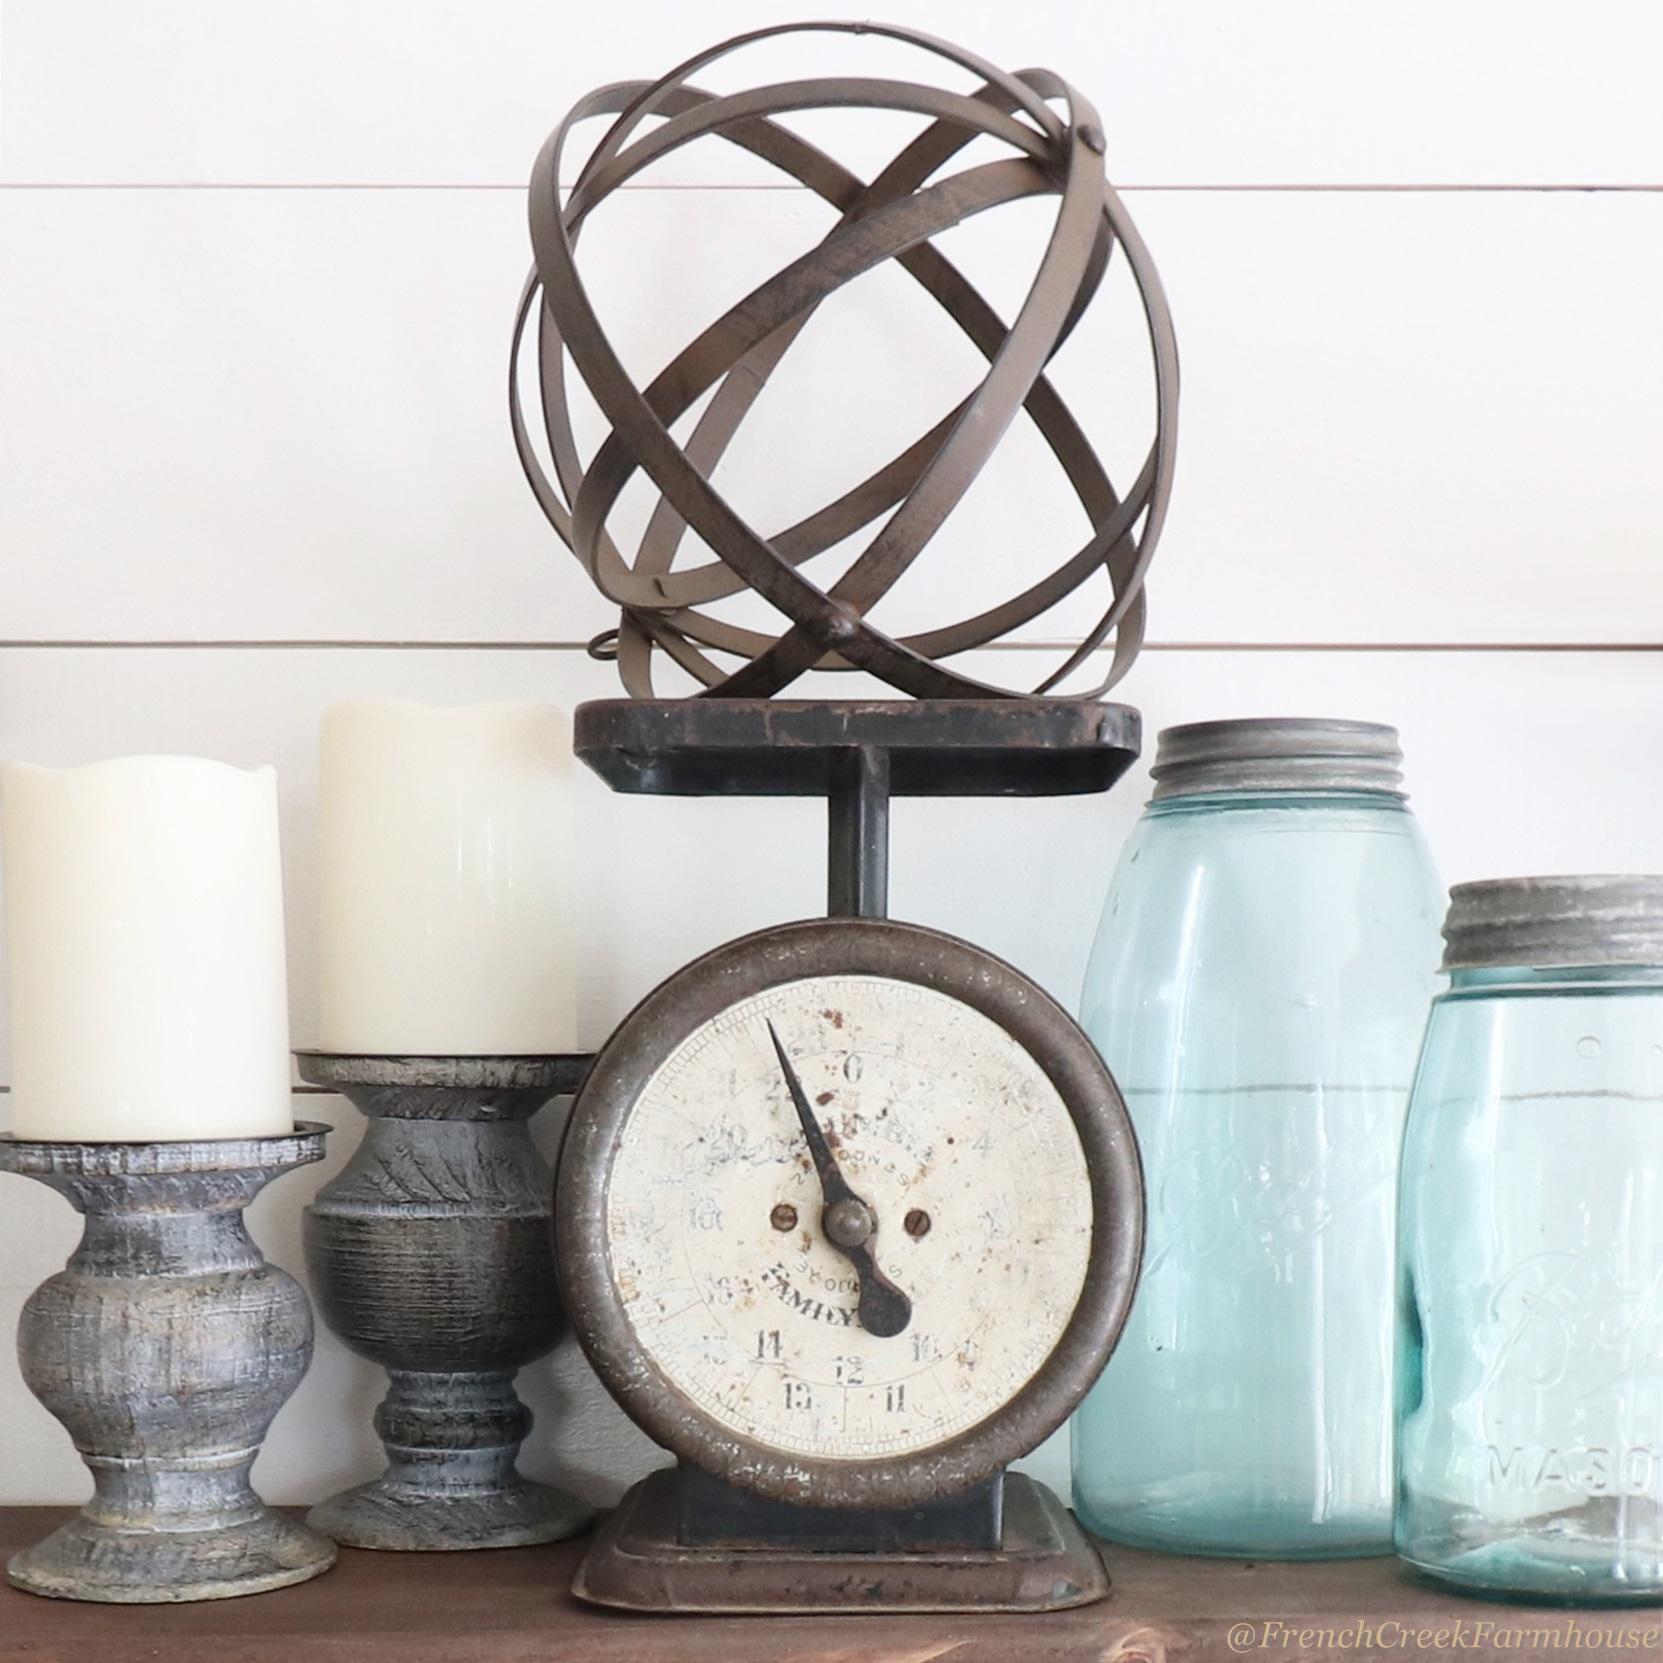 Blue mason jars and a vintage kitchen scale add Americana charm